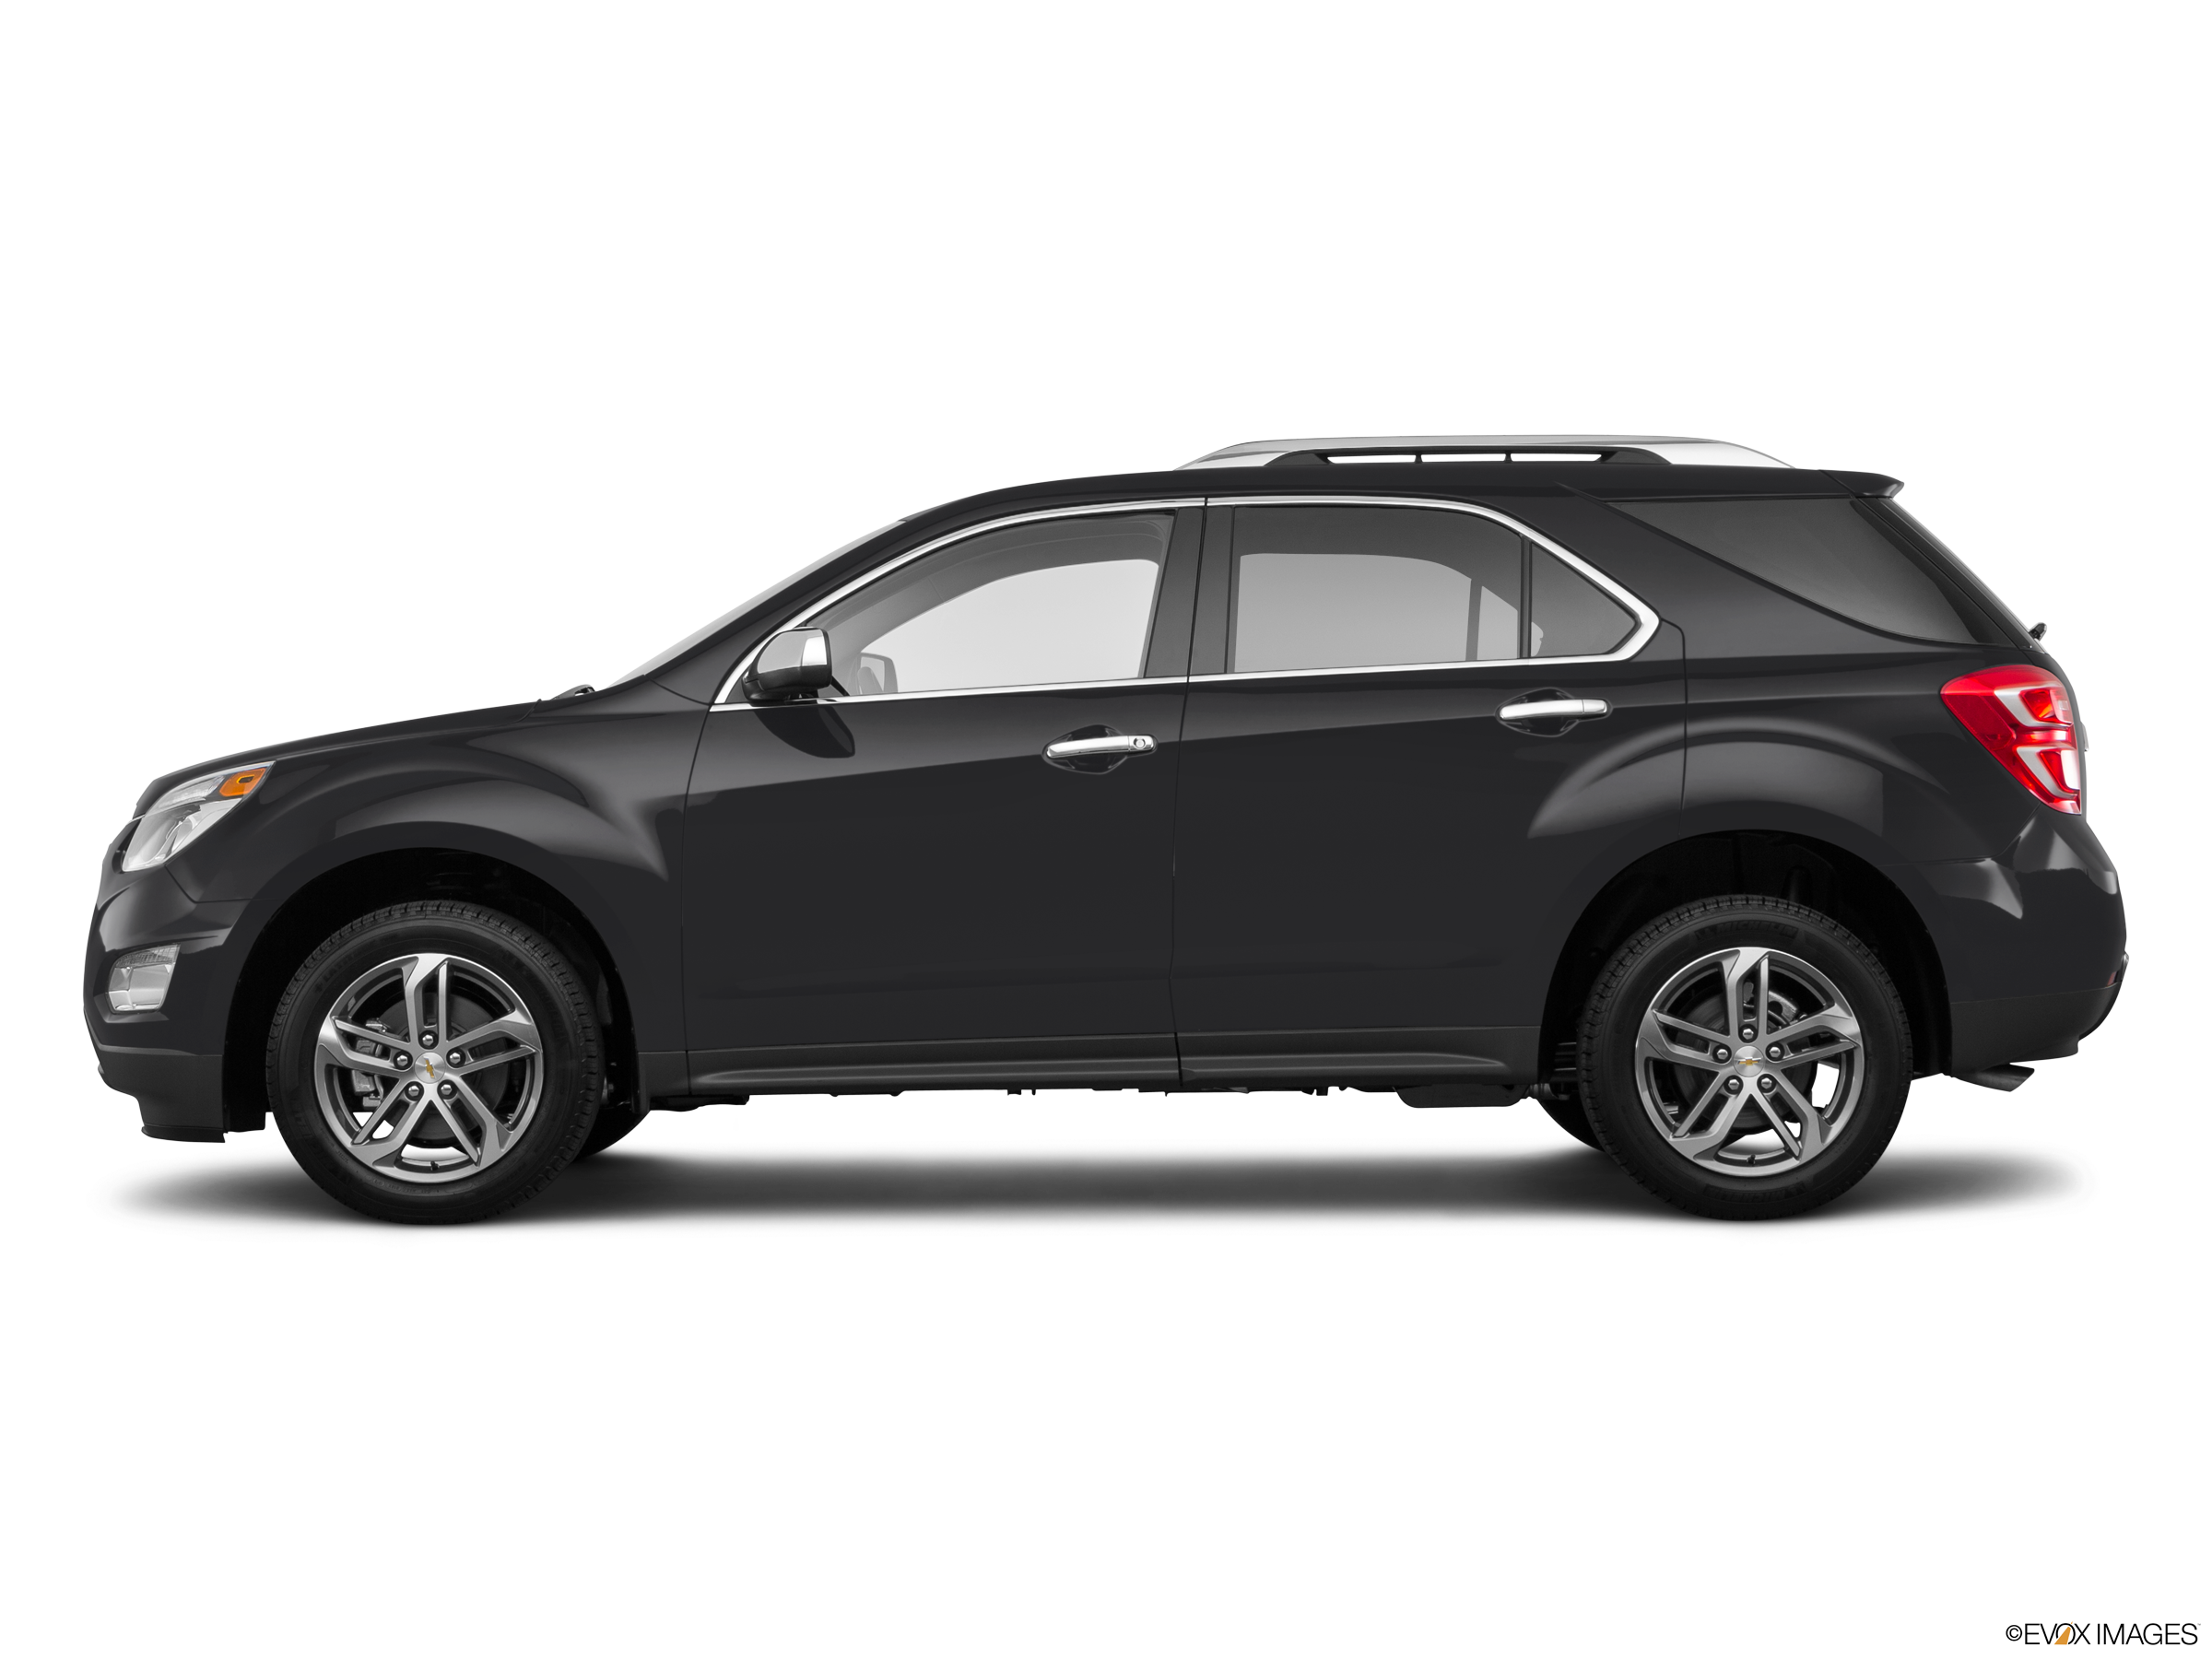 View Chevrolet Equinox details